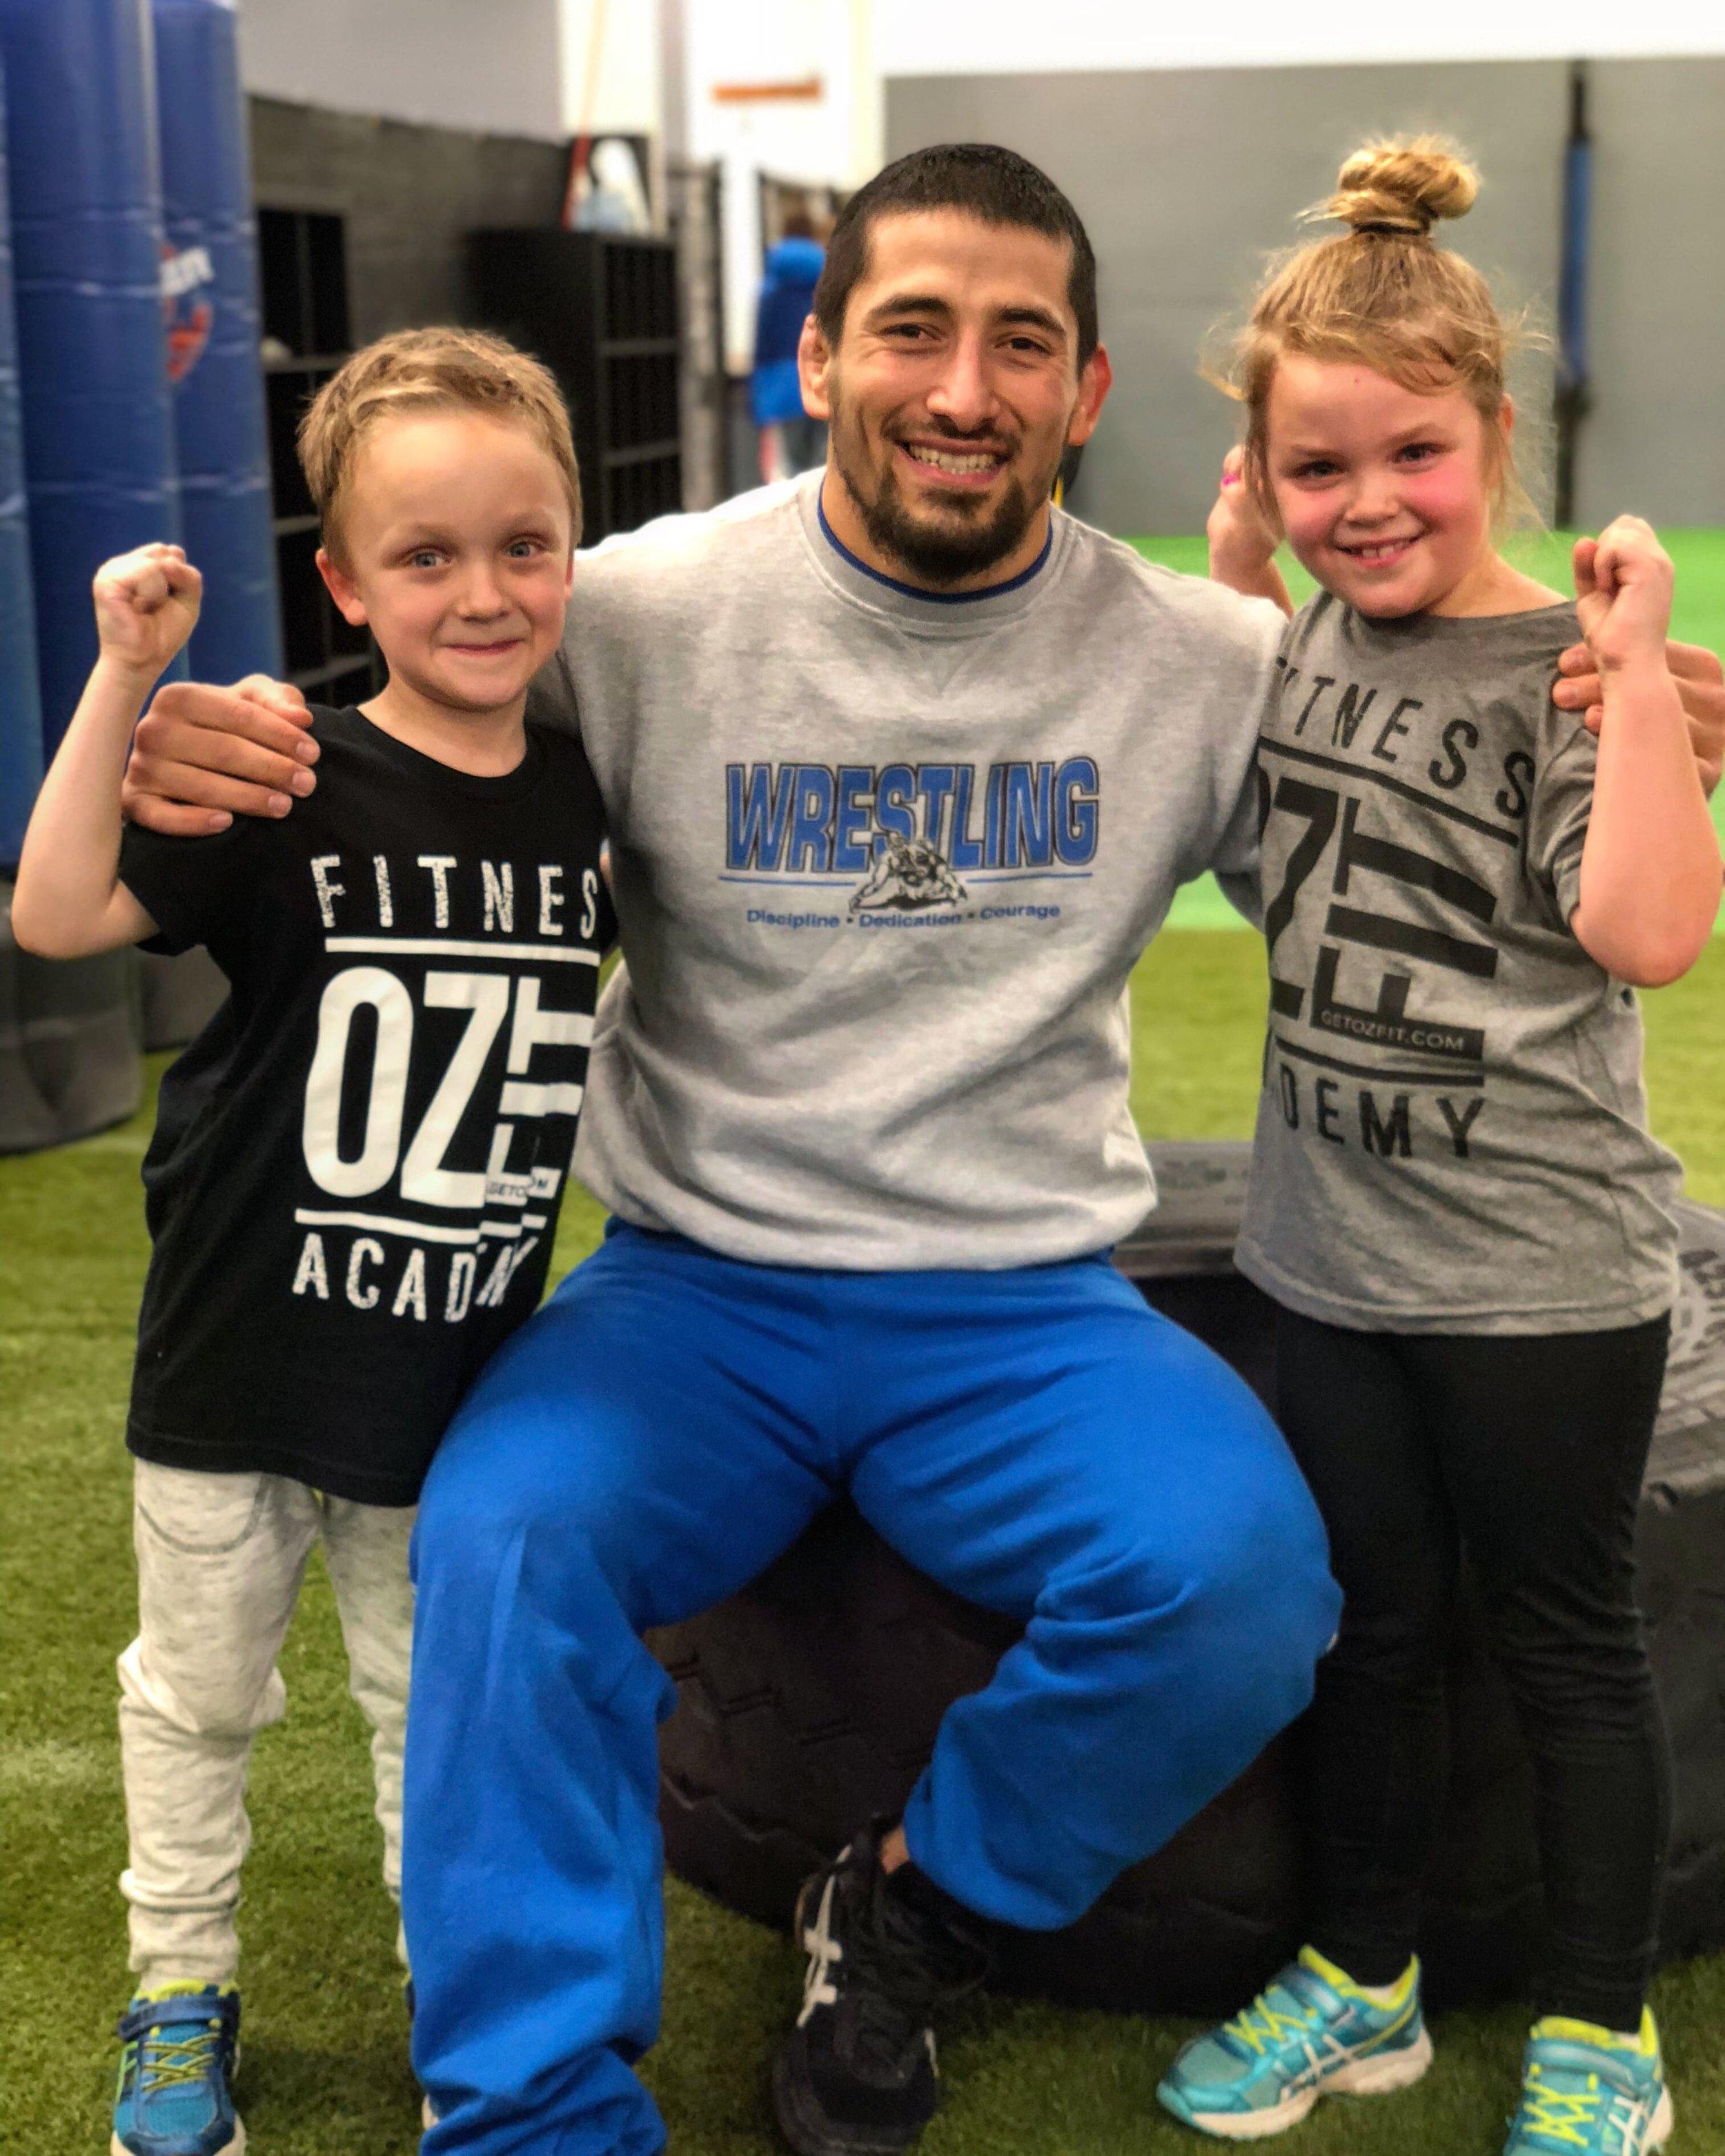 Get Oz Fit - Personal Trainer in Bergen County New Jersey - Ozzy Dugulubgov - Kids Training - Youth Fitness Program NJ (1)-min.JPG